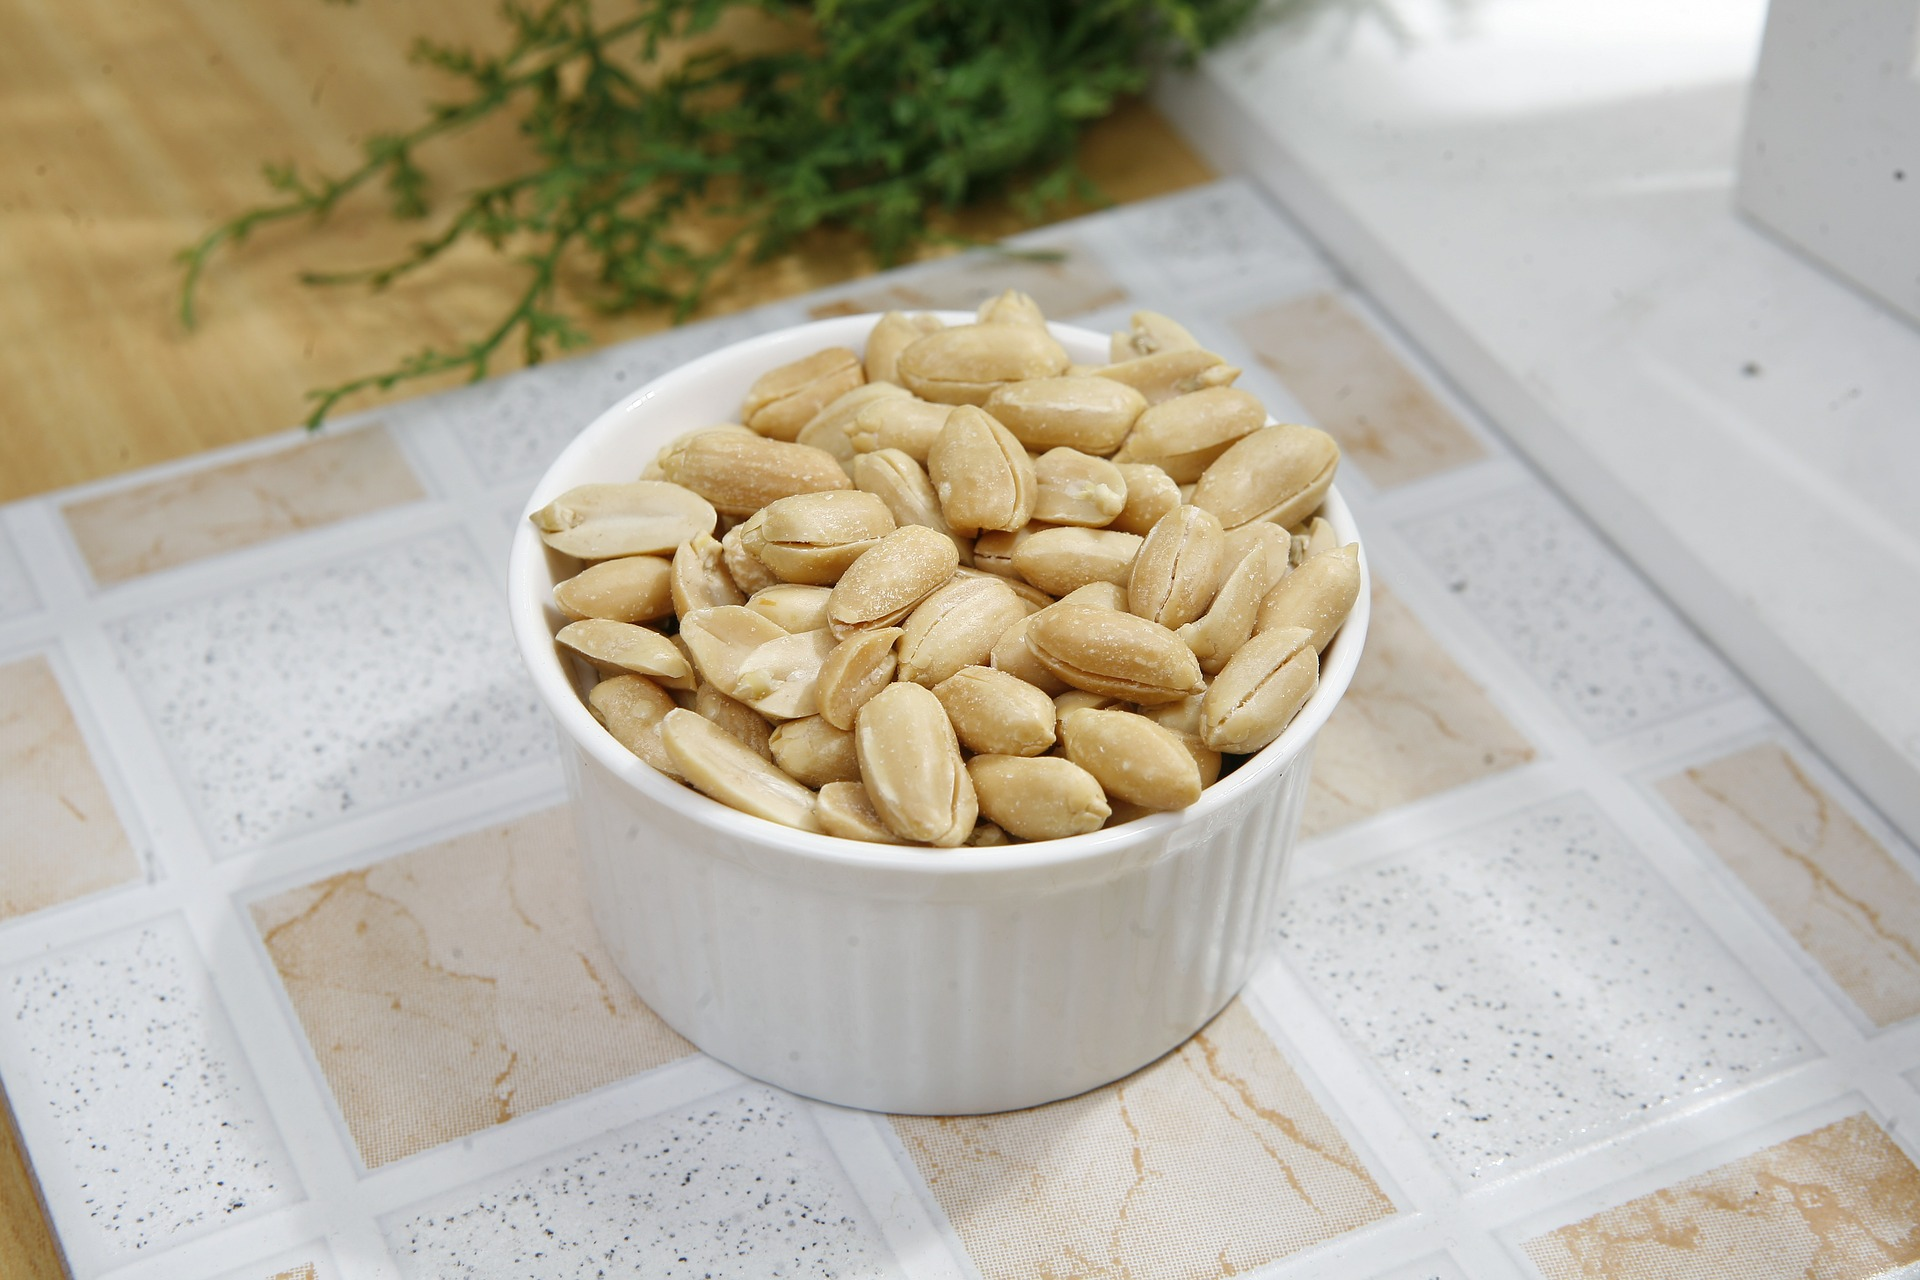 cachorro pode comer amendoim 2